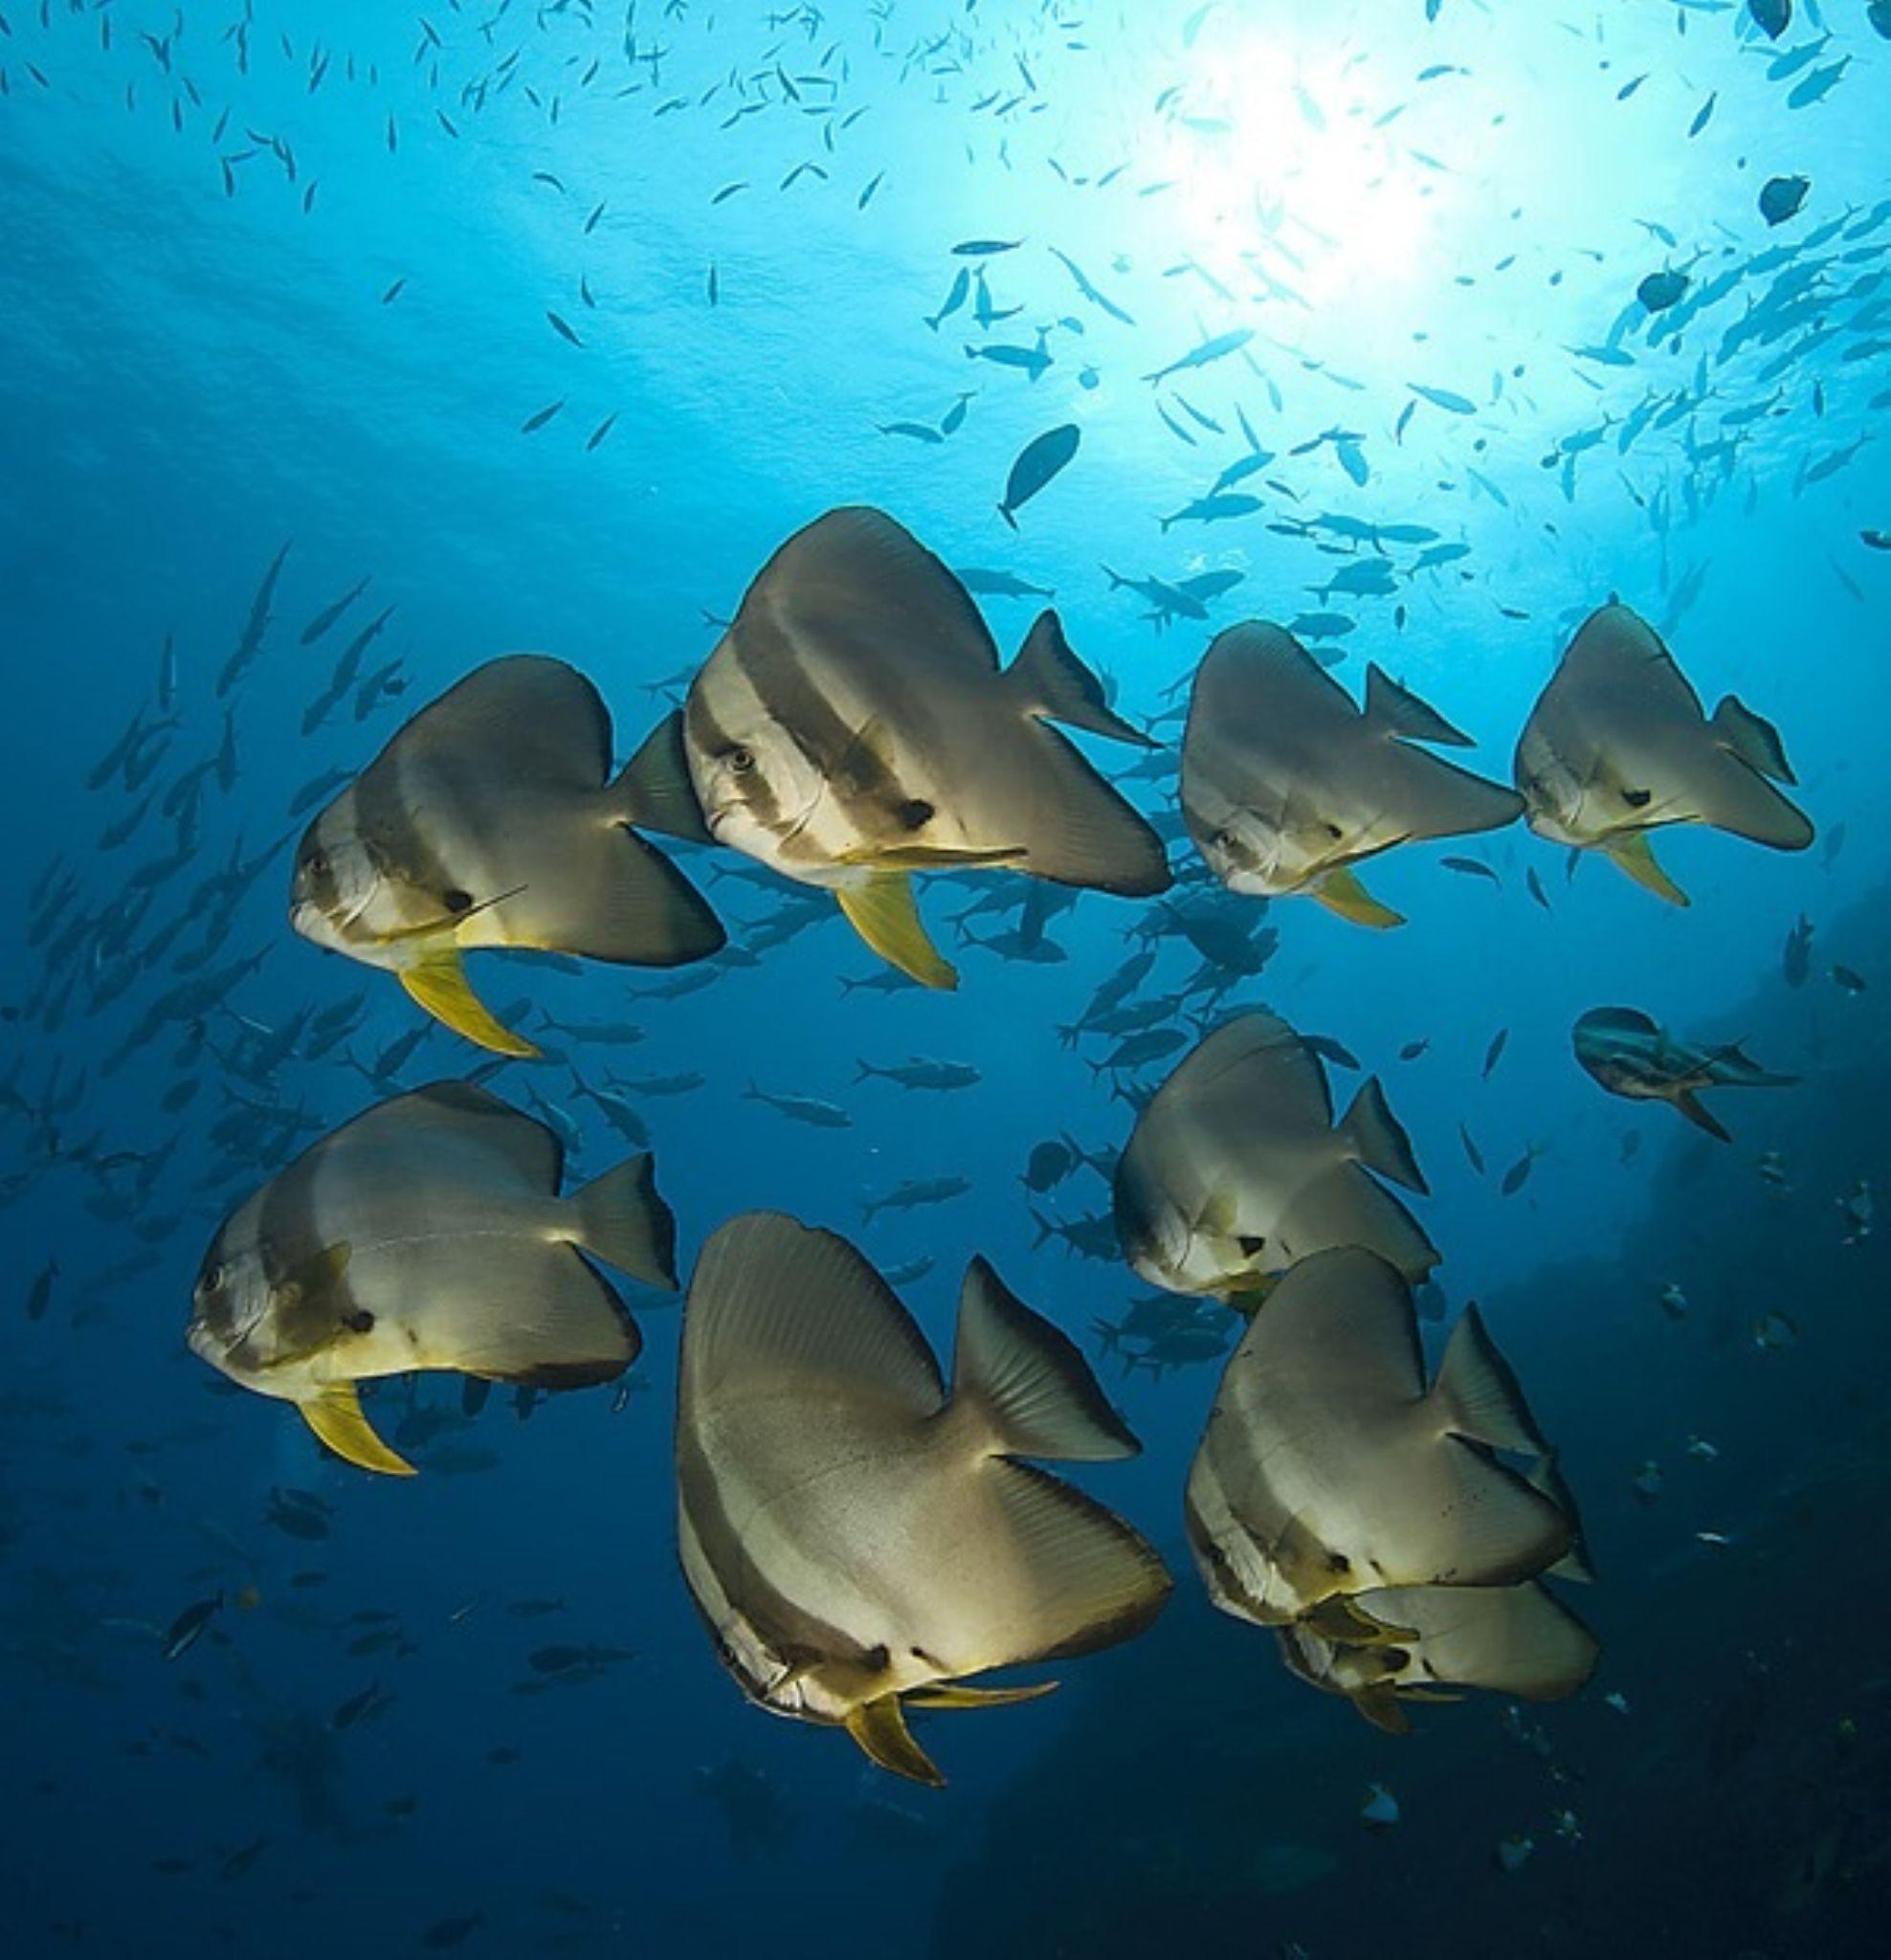 Bat Fish by Tony Brown